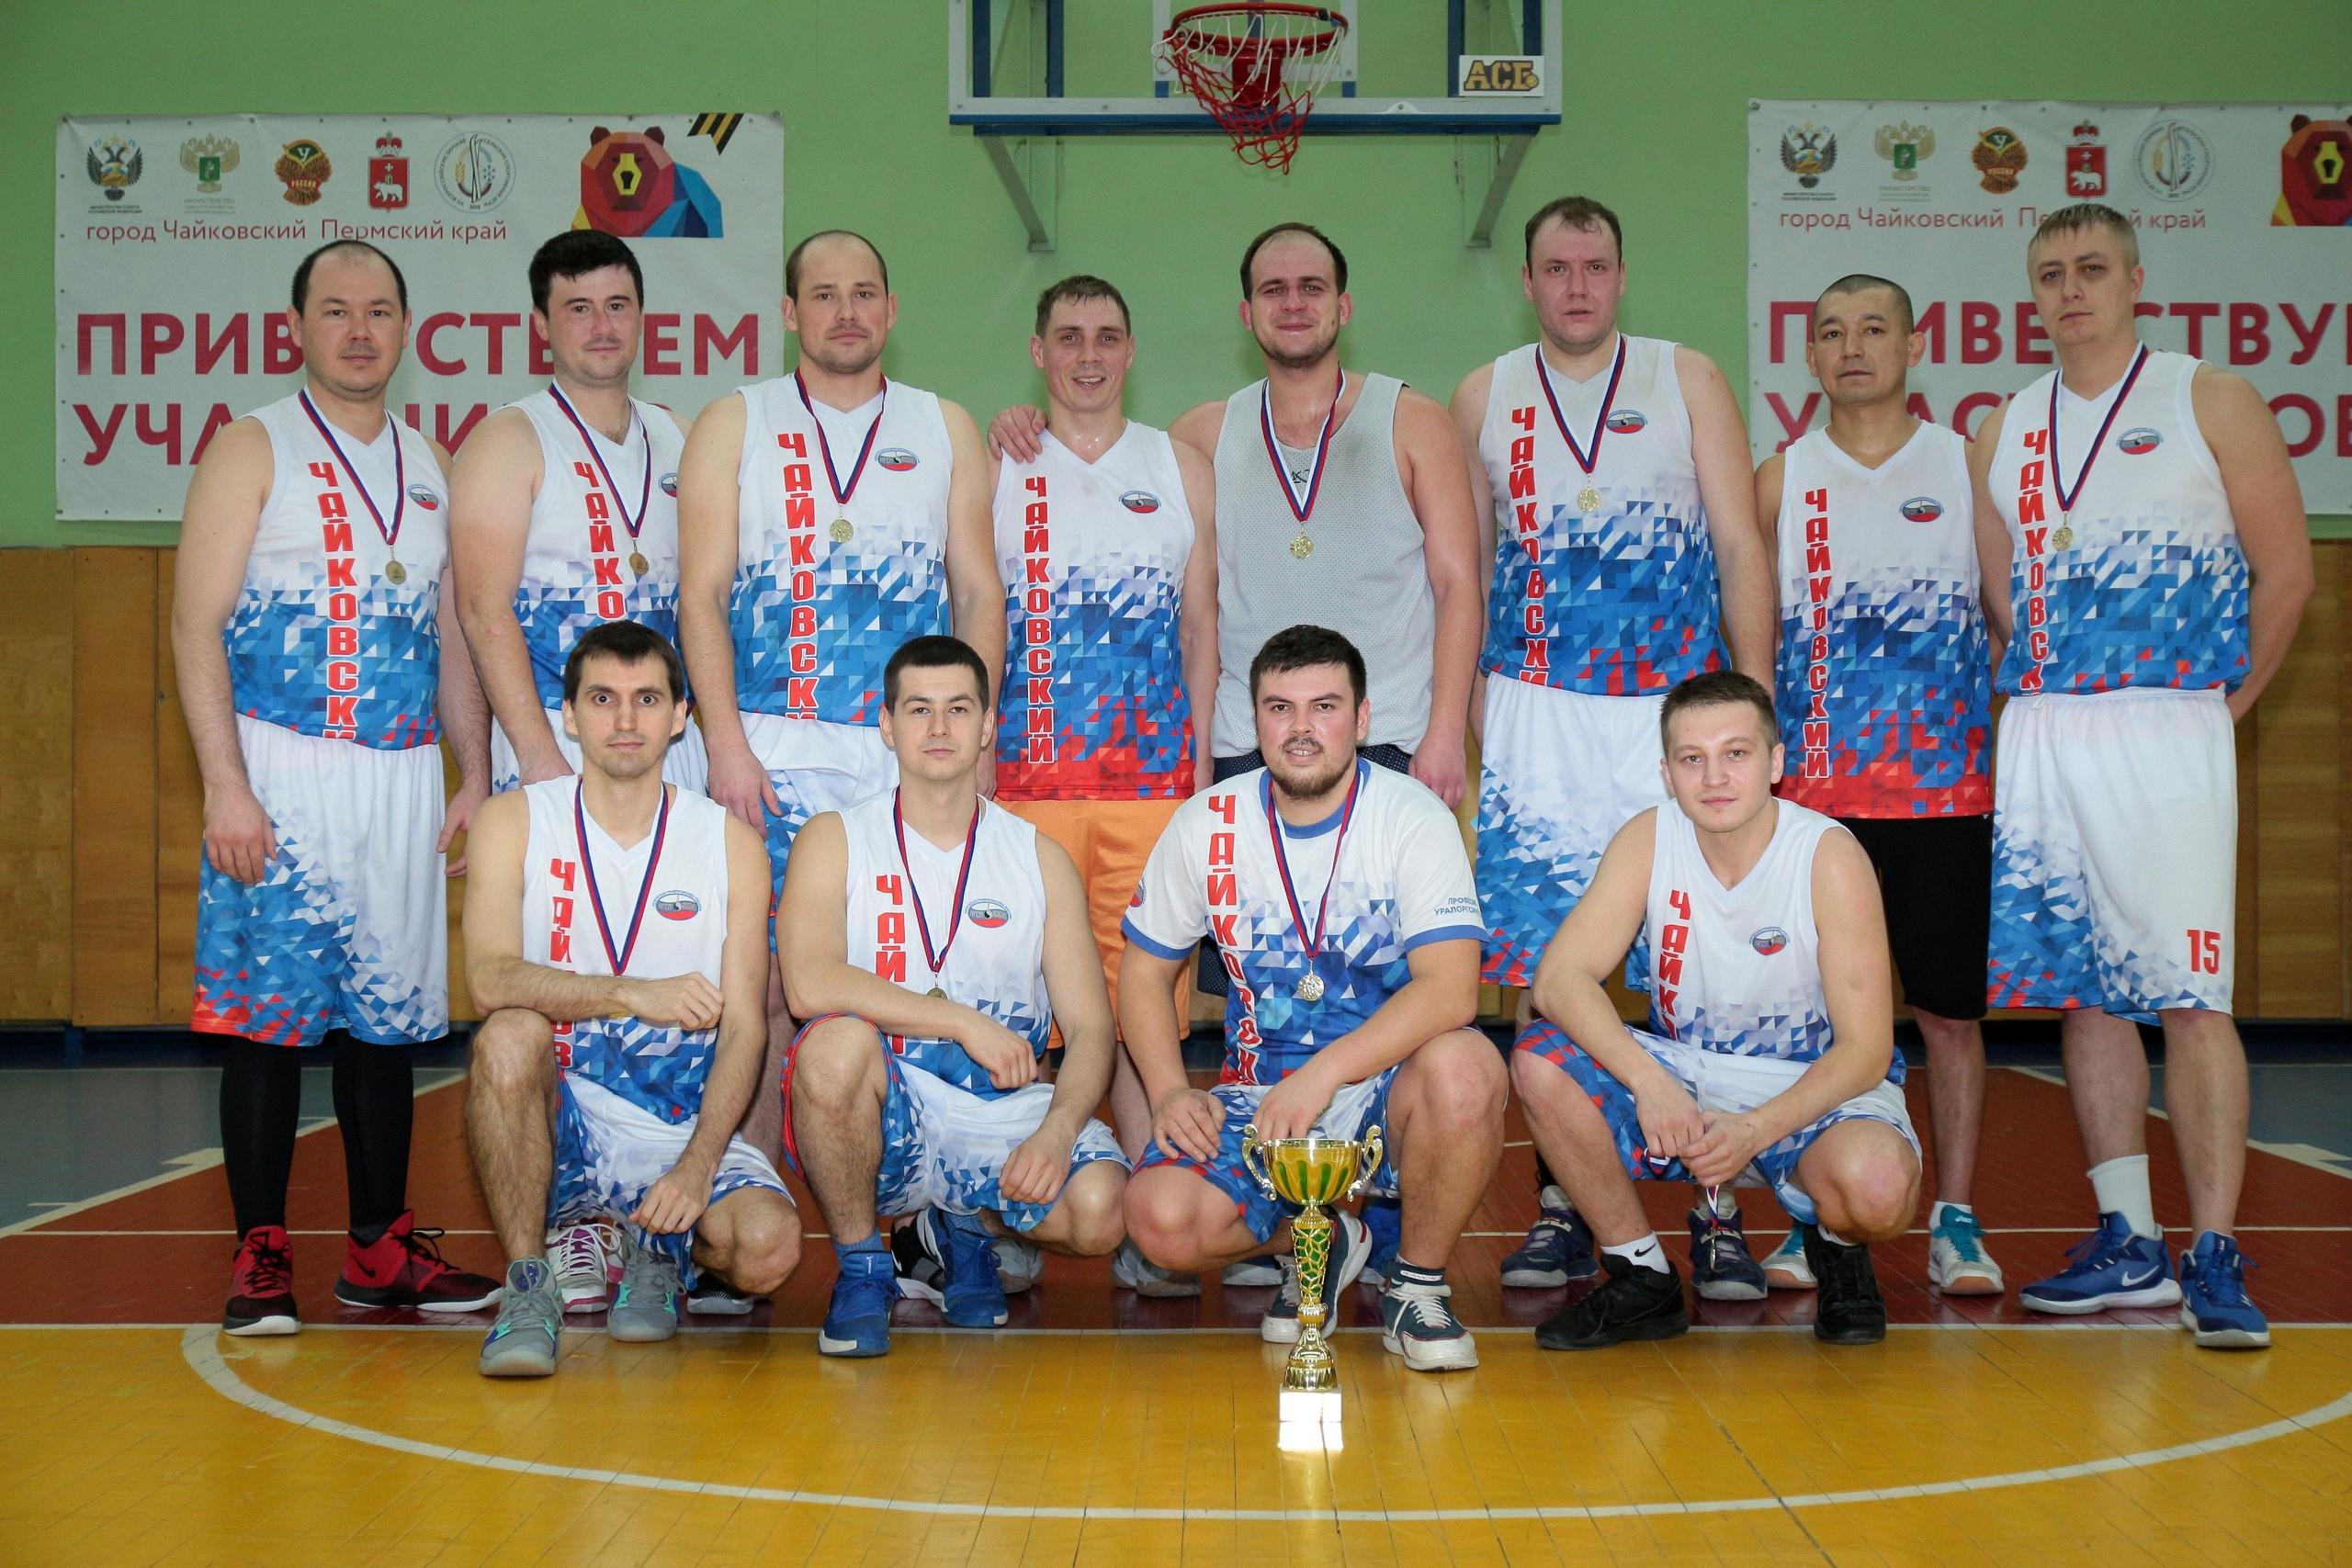 Кубок города по баскетболу, чайковский район, 2018 год